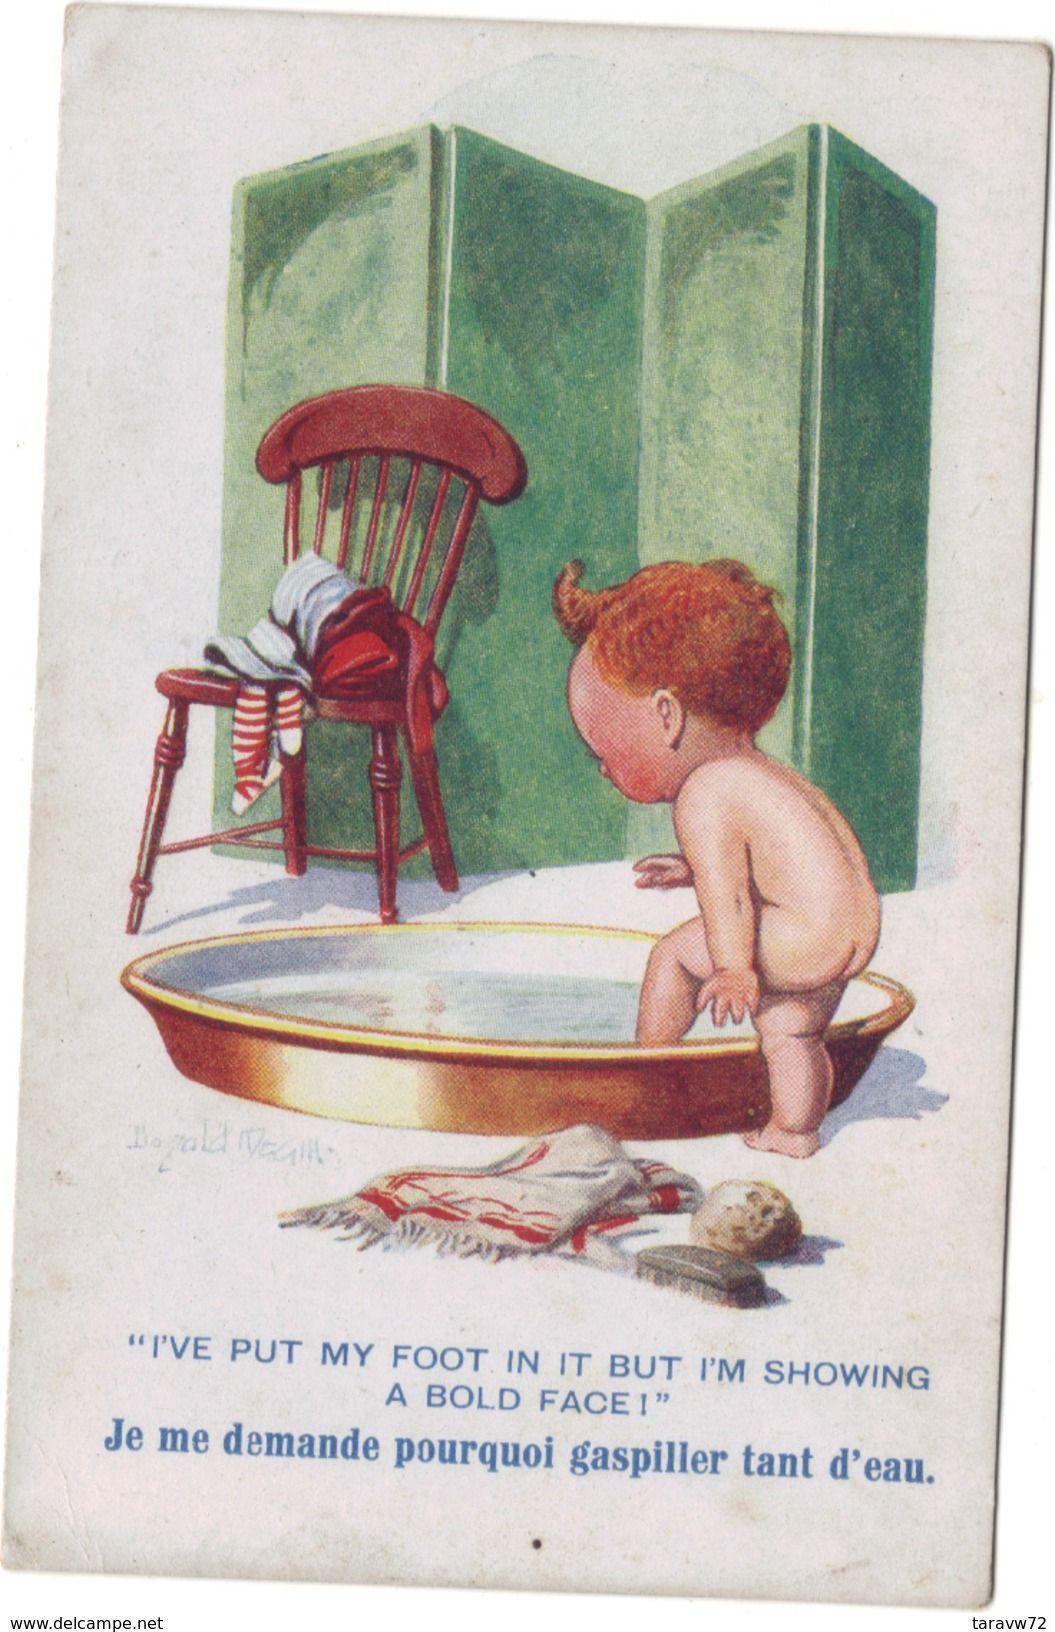 bathing.quenalbertini: Fantaisie enfant | Delcampe.fr